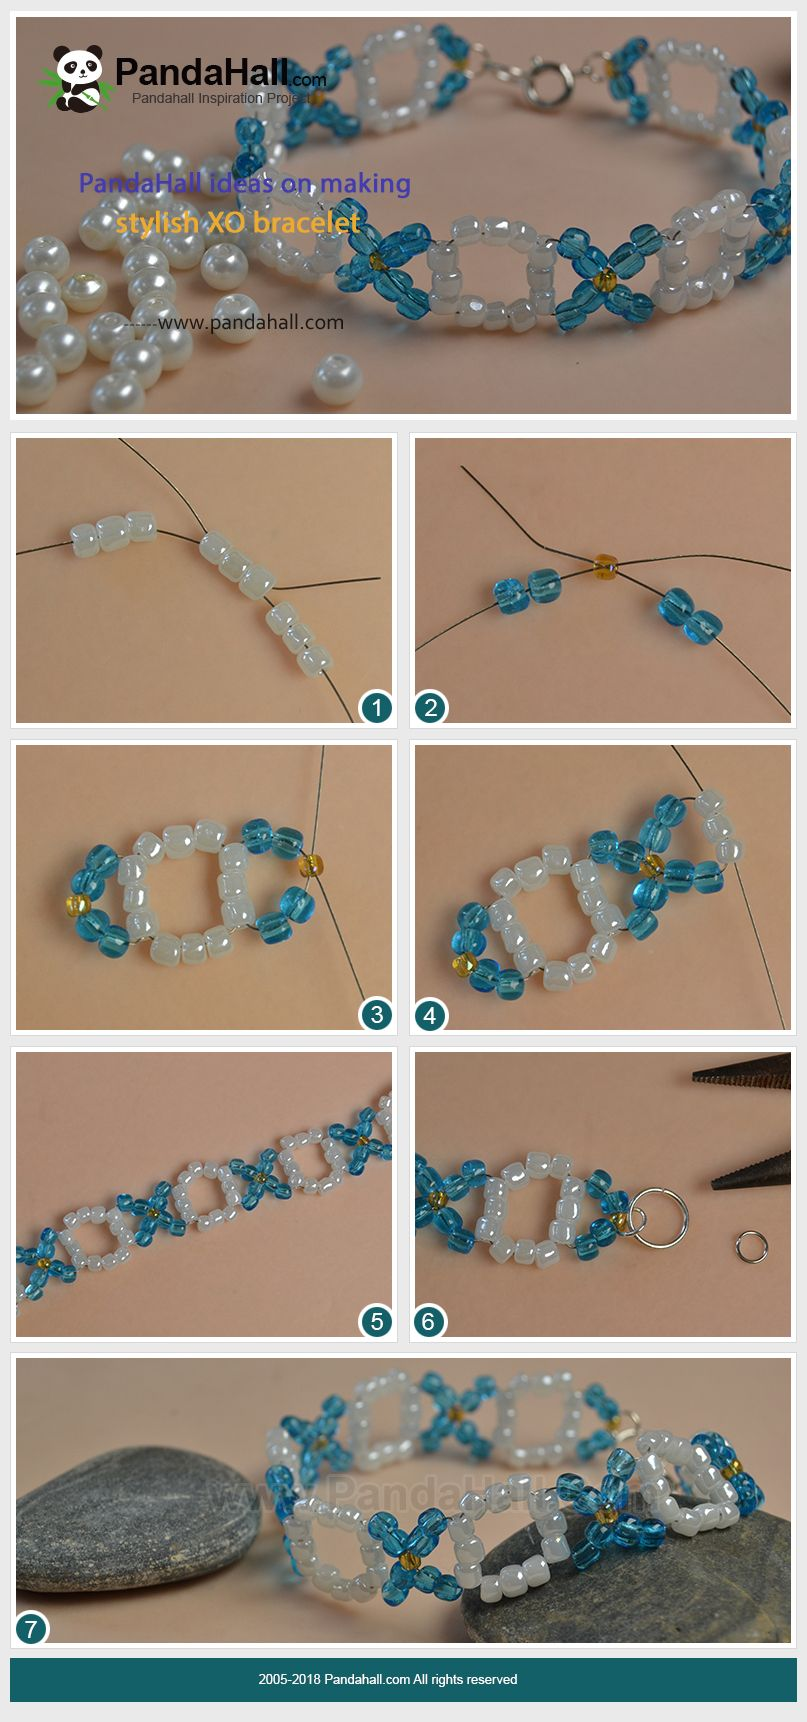 095e6afffe08  PandaHall ideas on making stylish XO bracelet Clases De Bisuteria